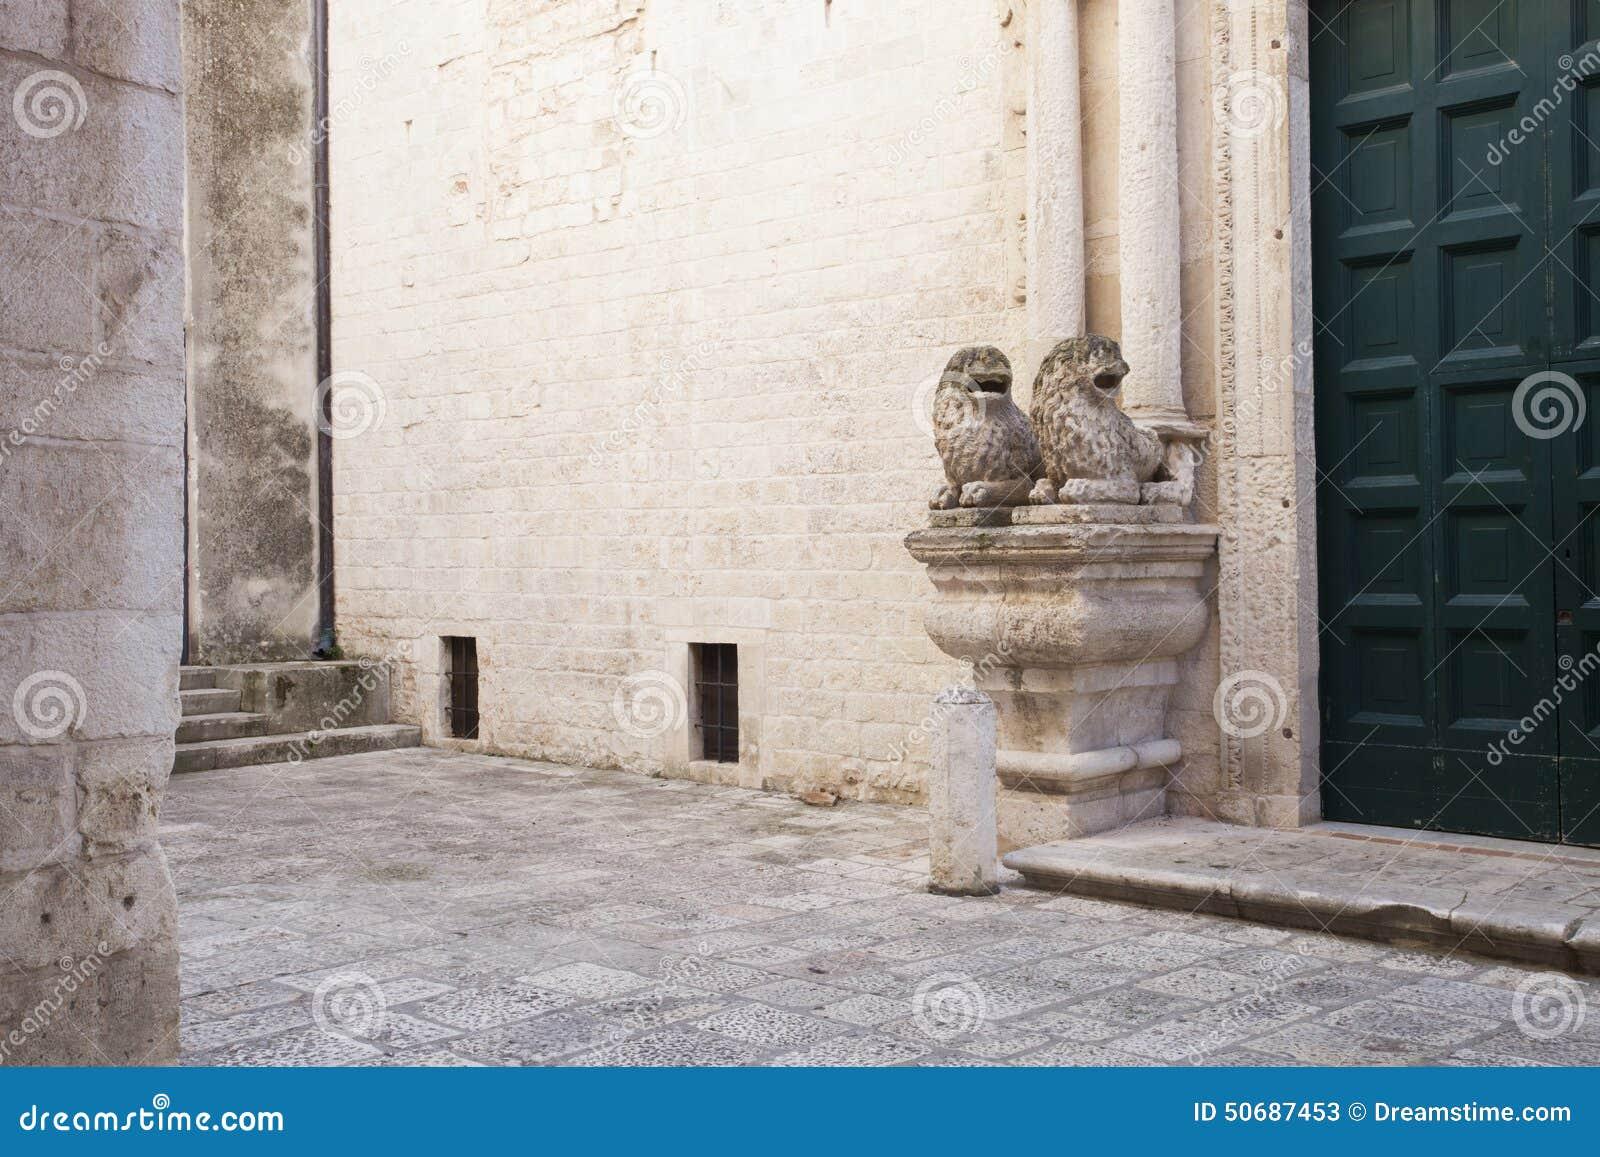 Download Cattedrale二孔韦尔萨诺,普利亚,意大利 库存图片. 图片 包括有 外面, 本尼迪克特的, 形成弧光的 - 50687453